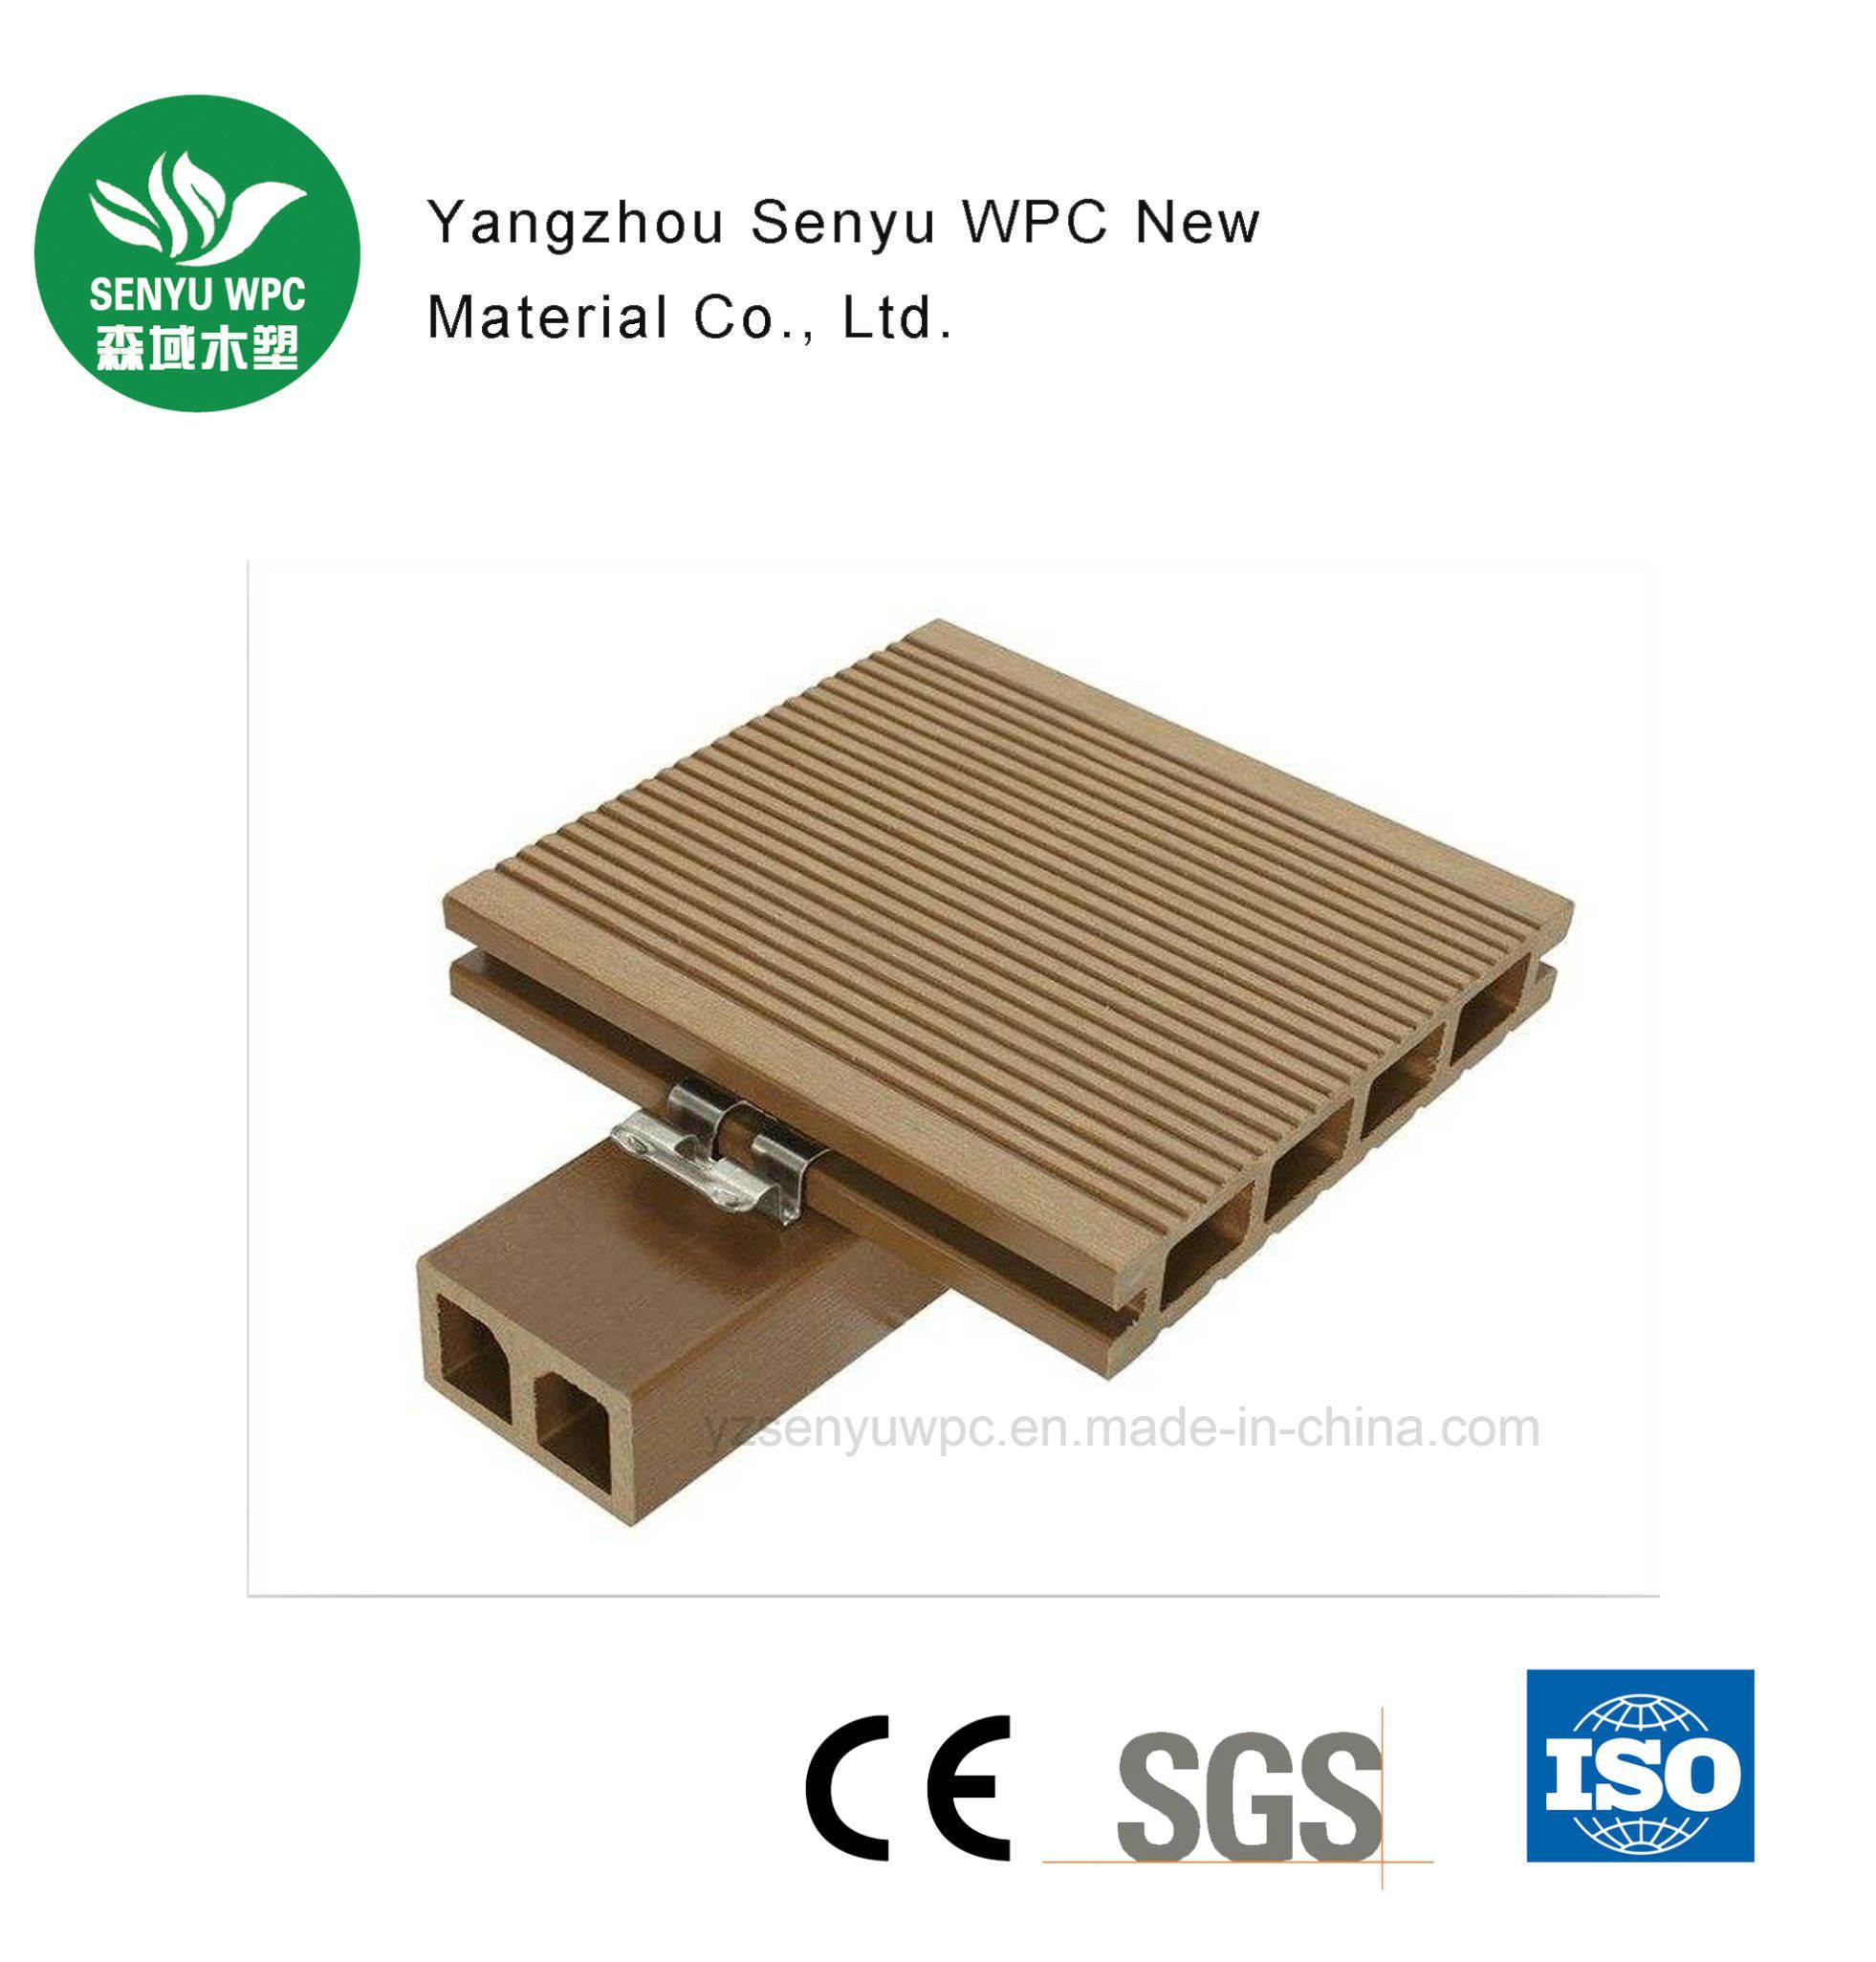 Wood Grain Anti-Aging Wholesale WPC Flooring